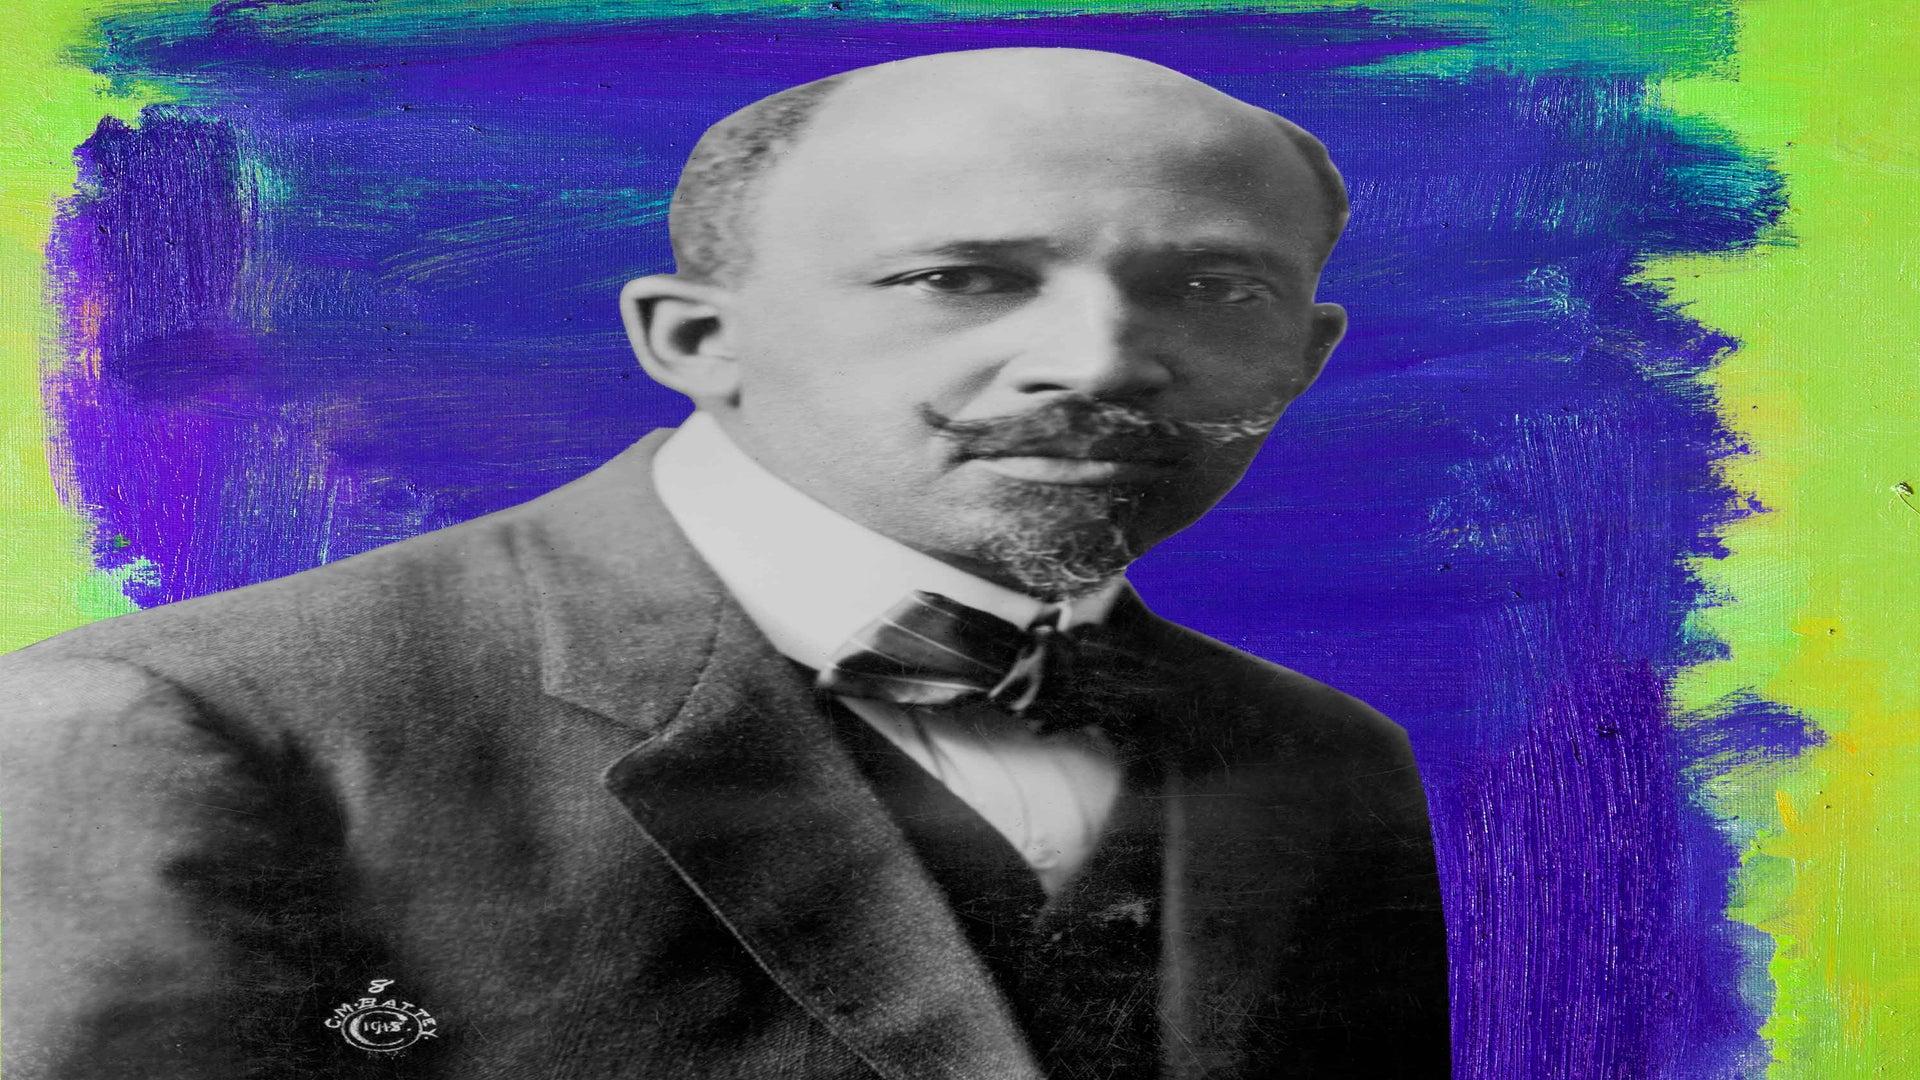 Restless Classics Edition Of 'The Souls Of Black Folk' By W. E. B. Du Bois